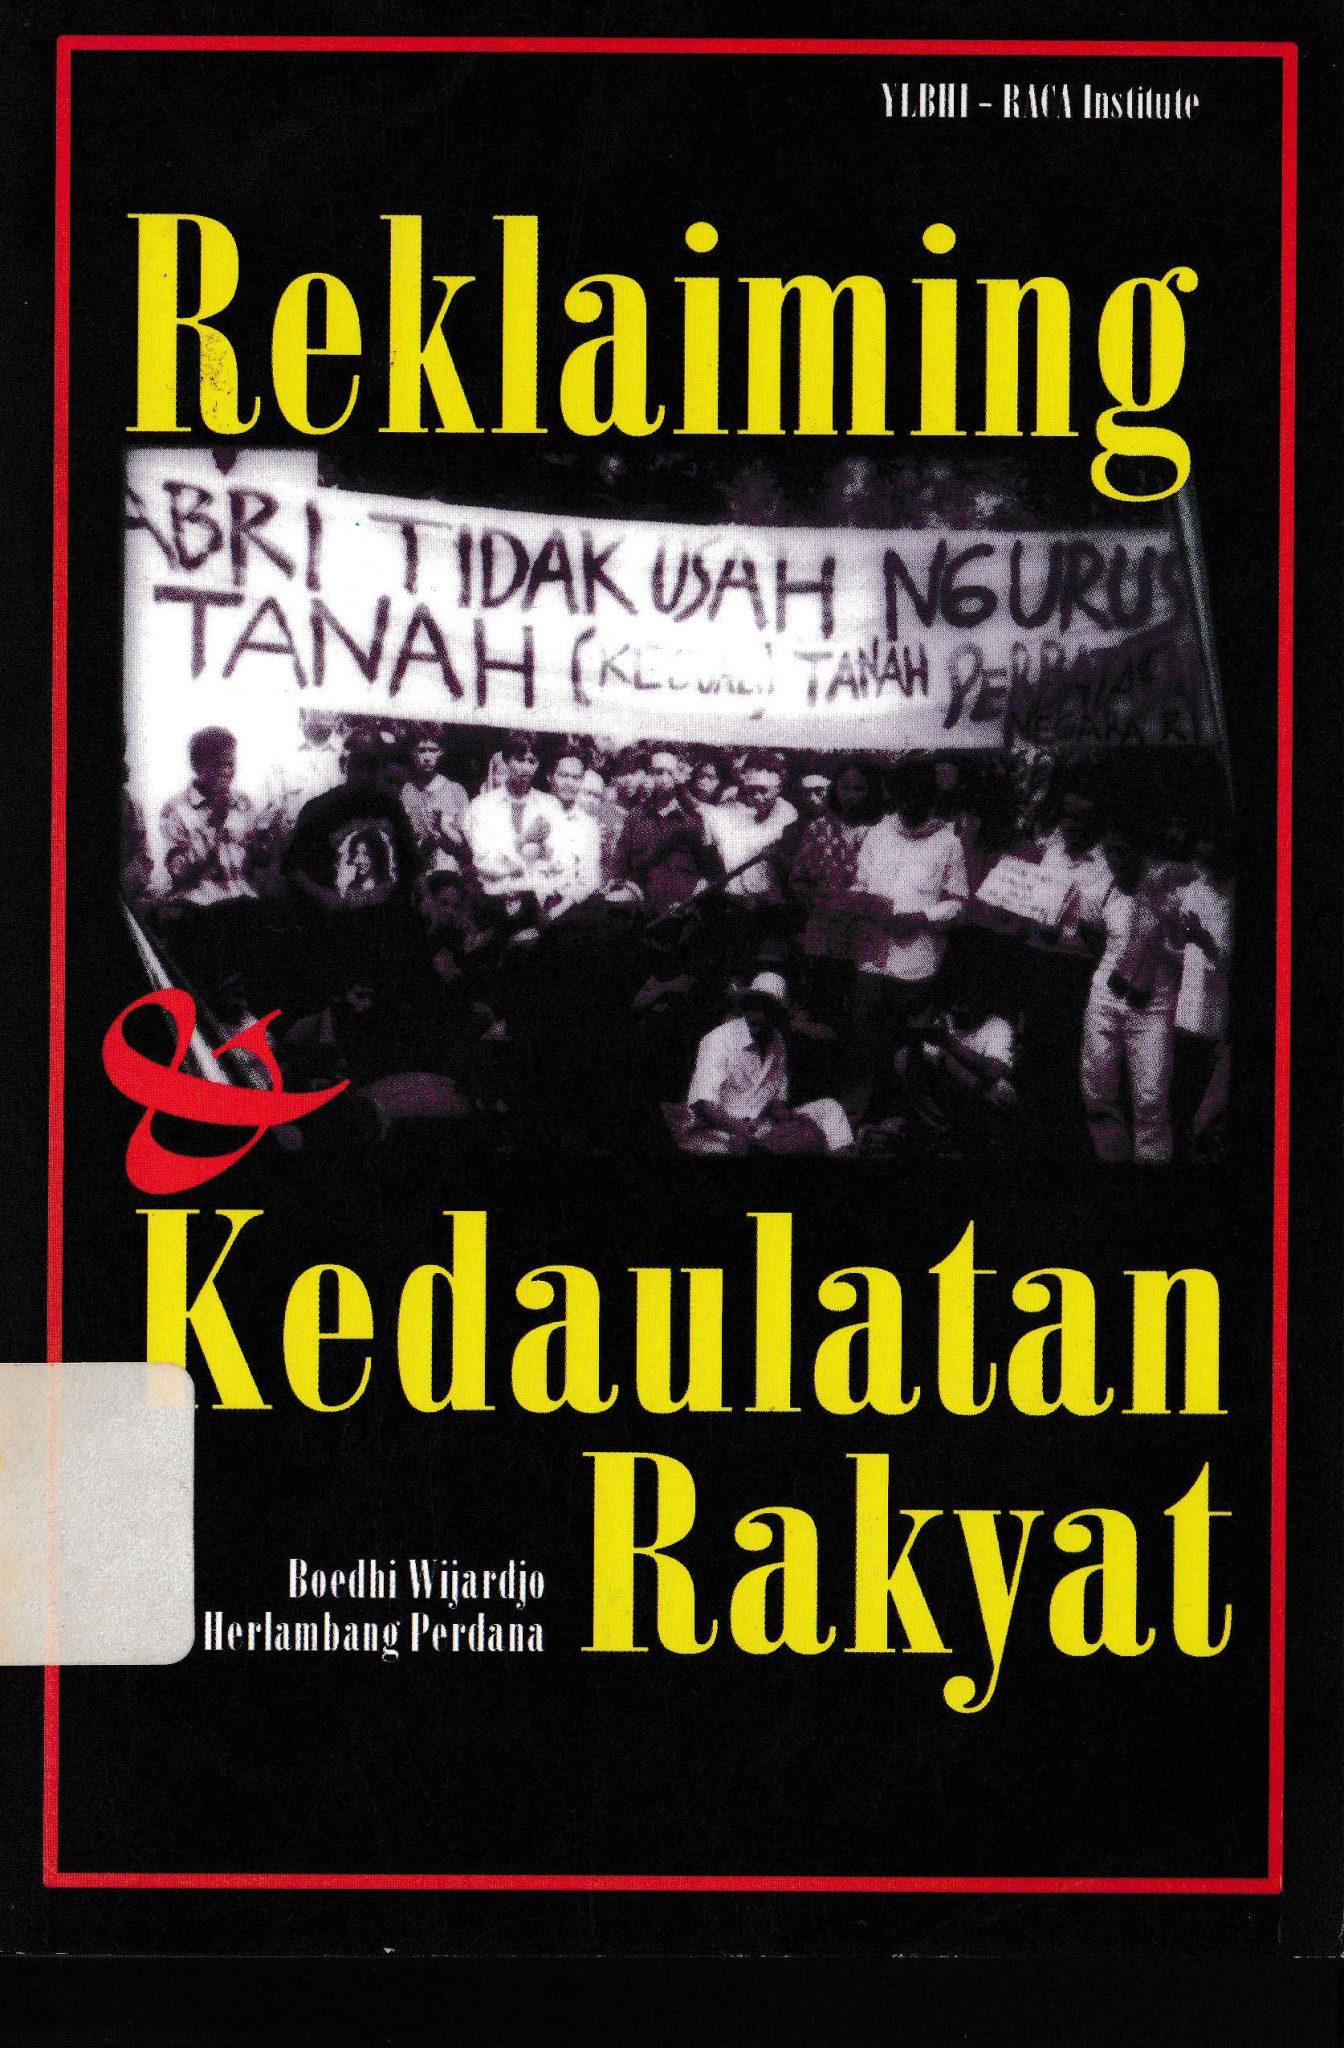 Reklaiming & Kedaulatan Rakyat